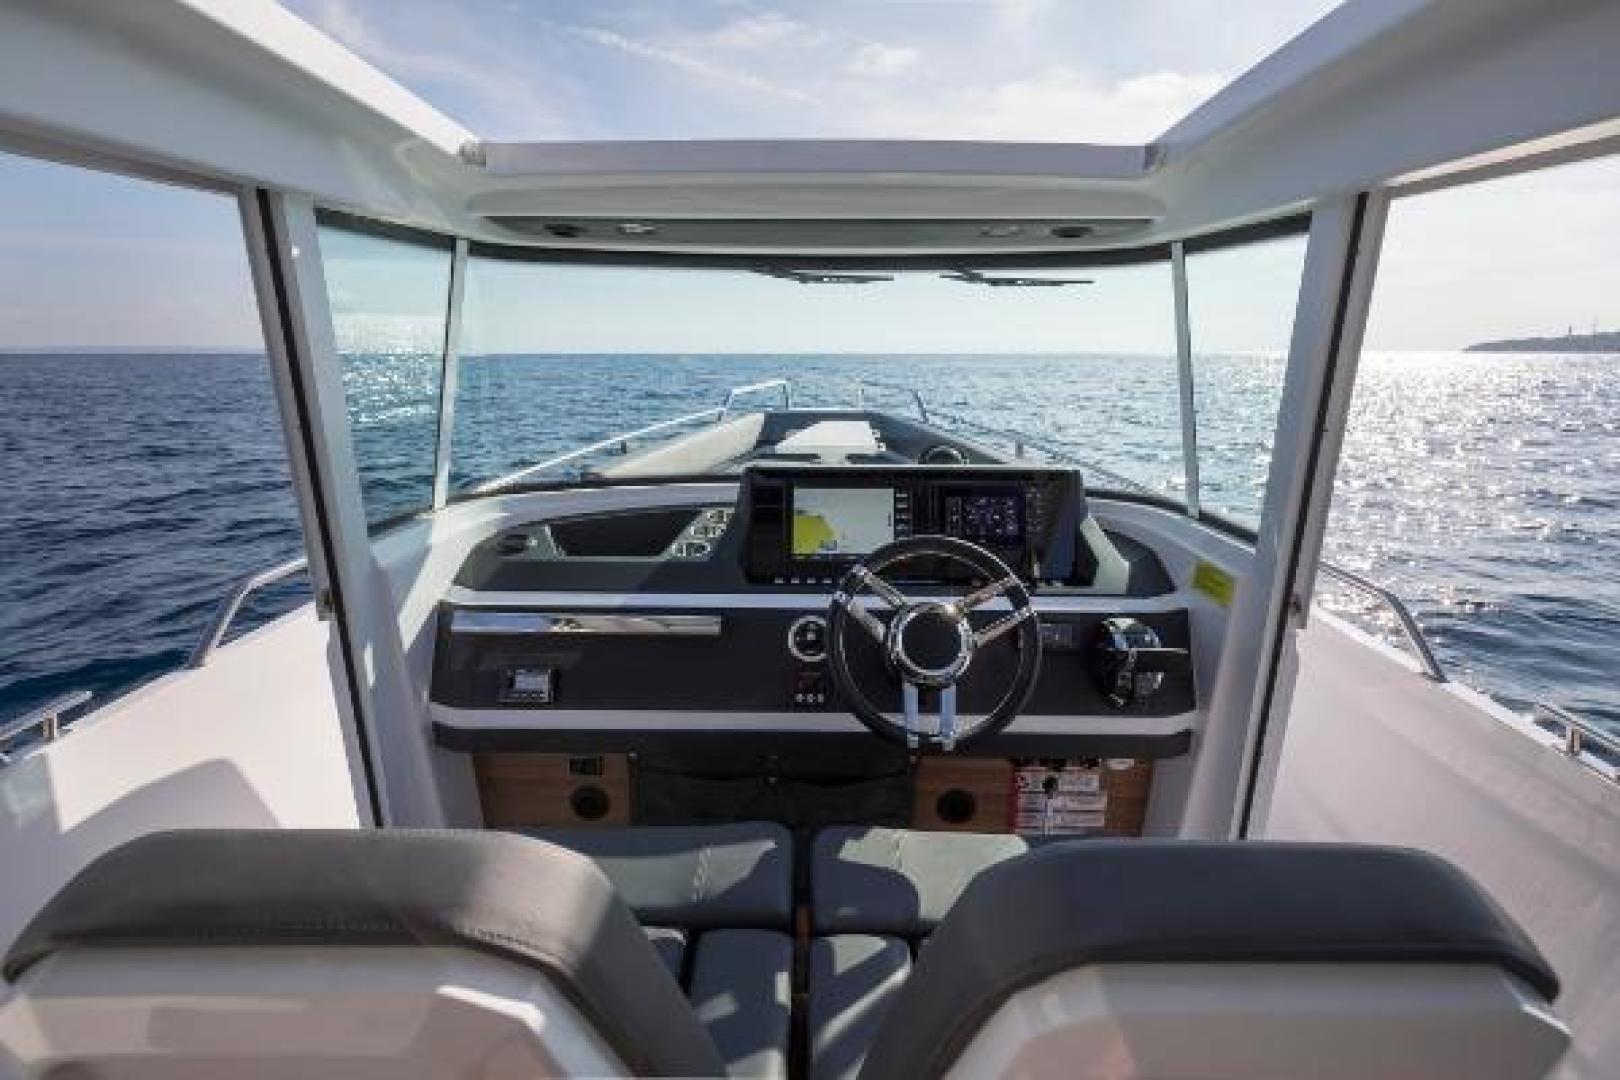 Axopar-28 CABIN 2021-Axopar 28 CABIN Tampa Bay-Florida-United States-1531513 | Thumbnail